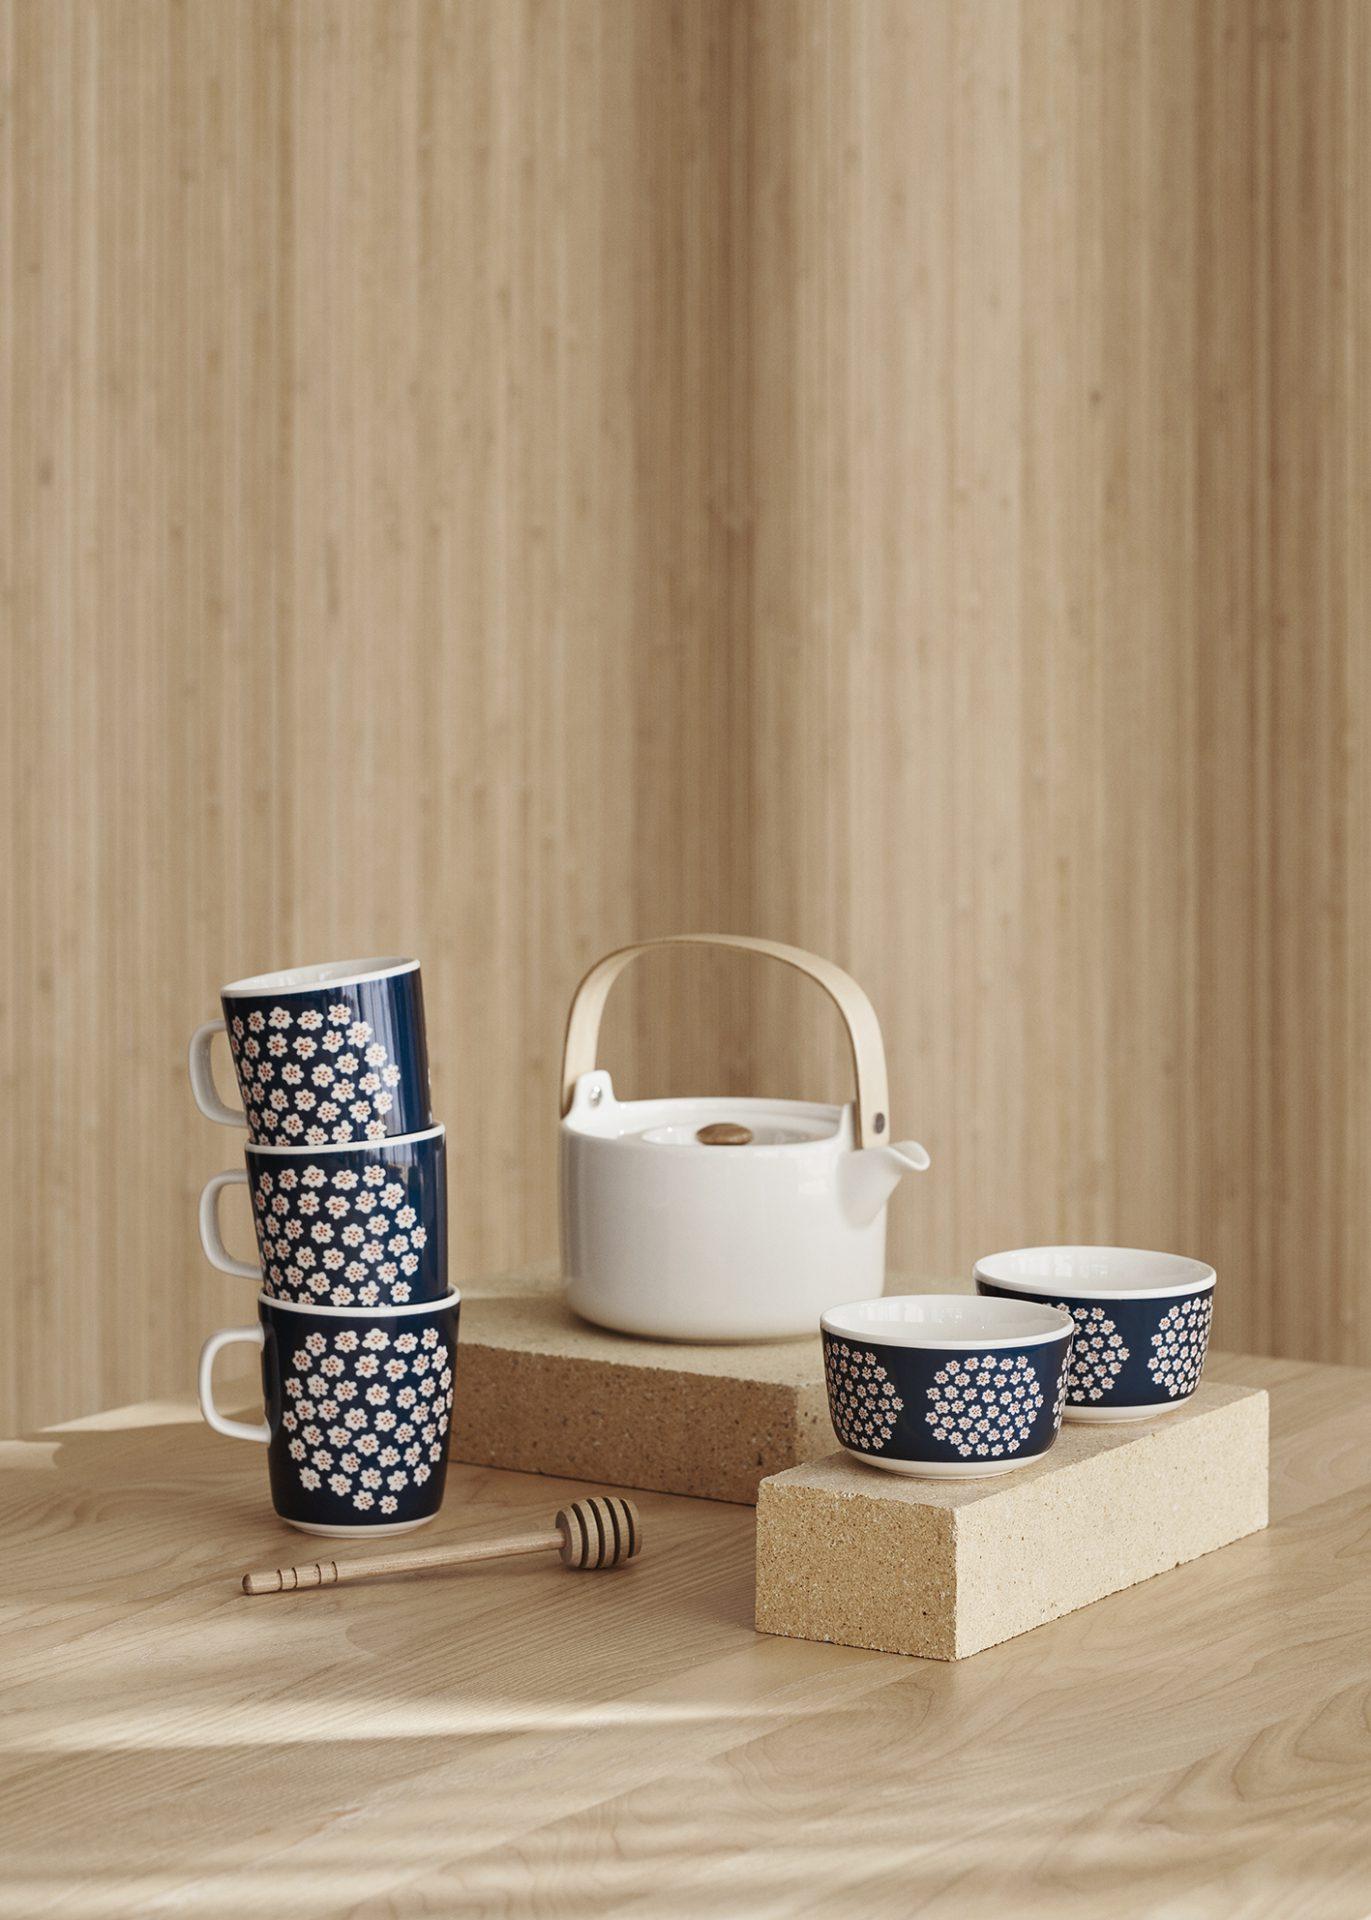 Marimekko Japan II for Marimekko by Susanna Vento